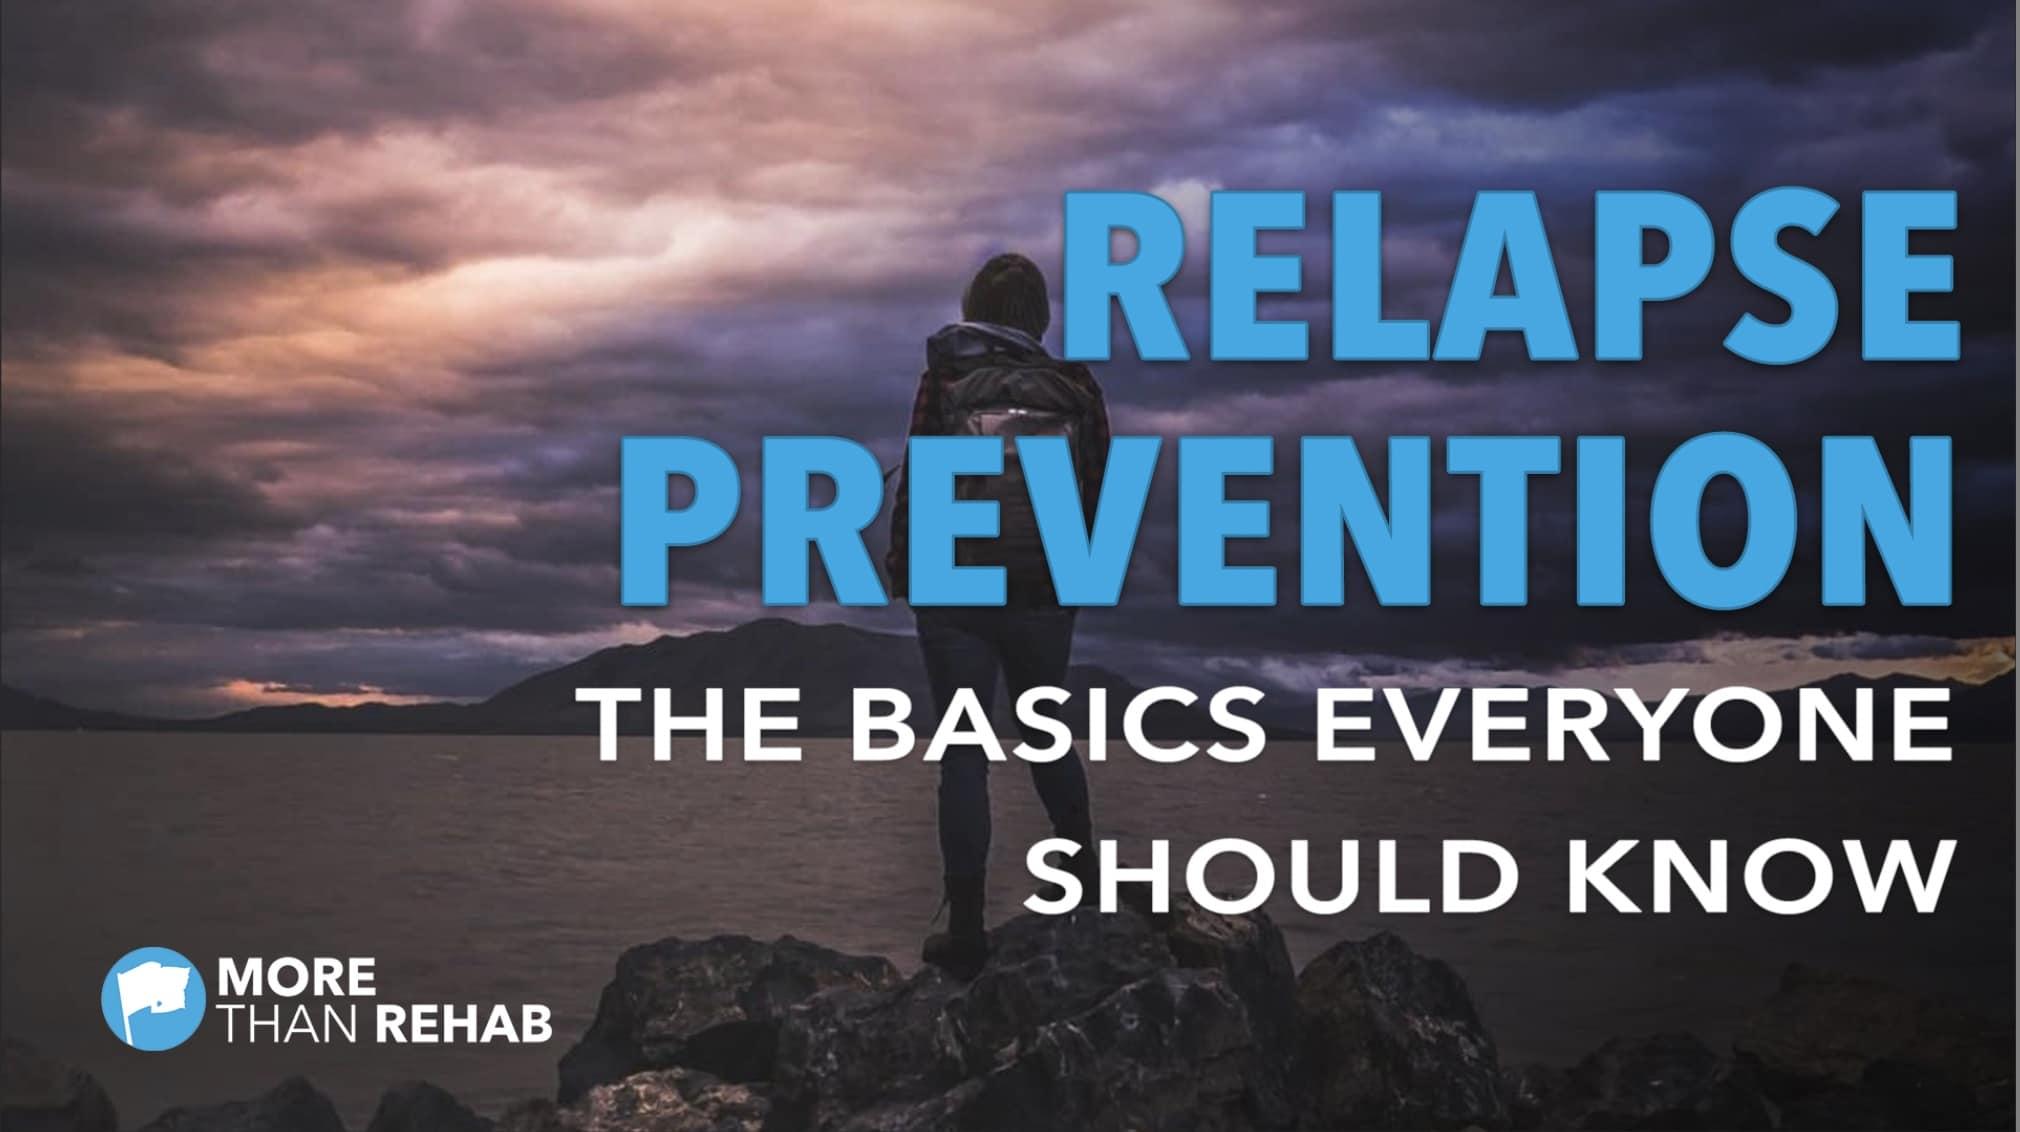 relapse-prevention-drug-addiction-treatment-Houston-Texas-rehab